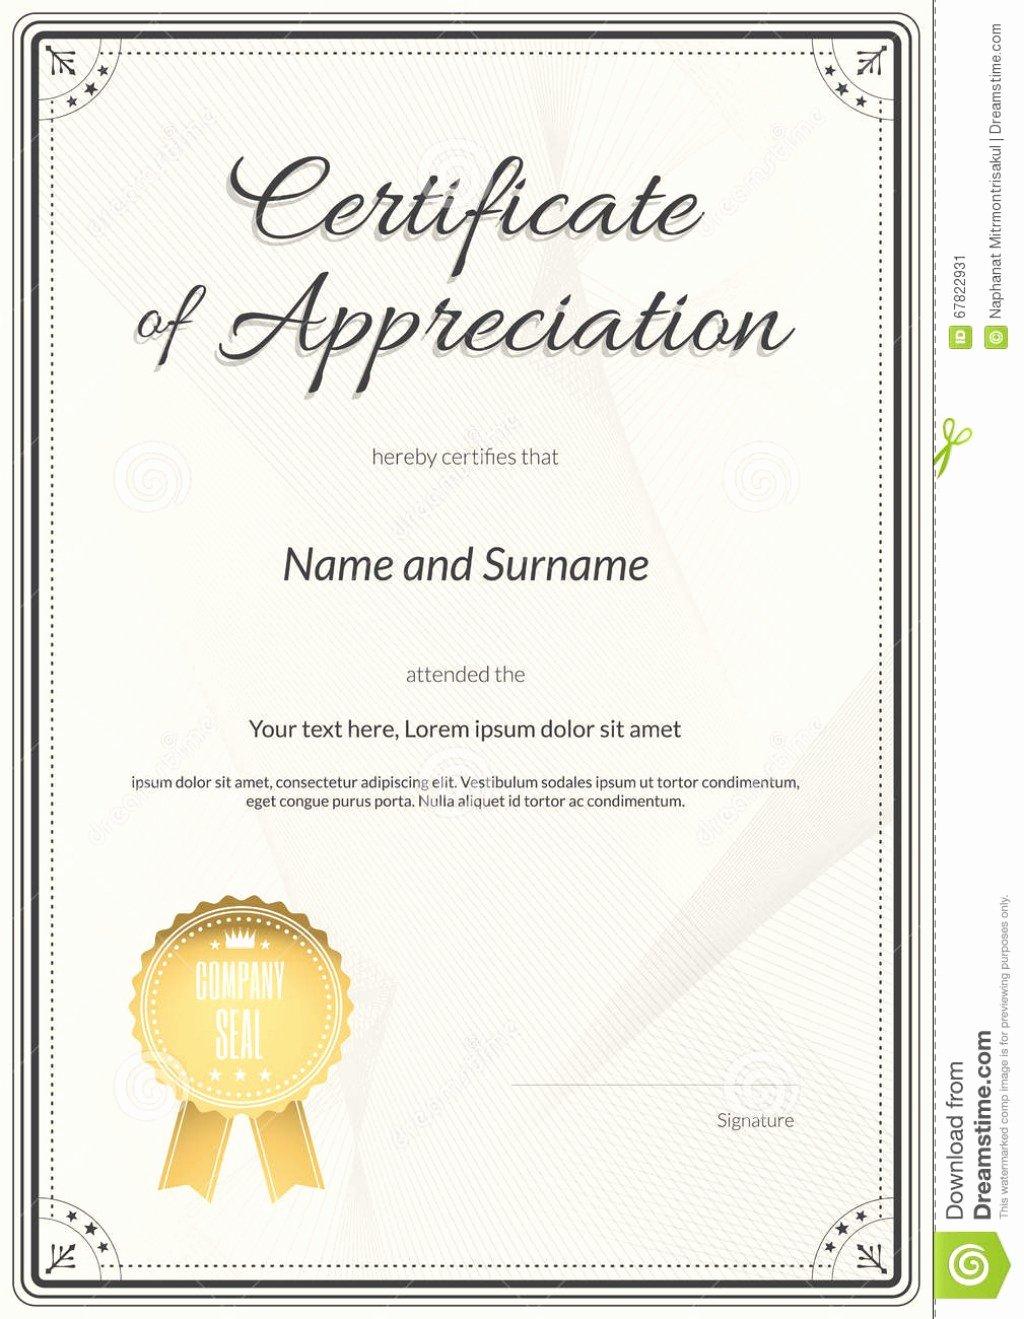 Graduation Certificate Of Appreciation Unique Certificate In Appreciation Template